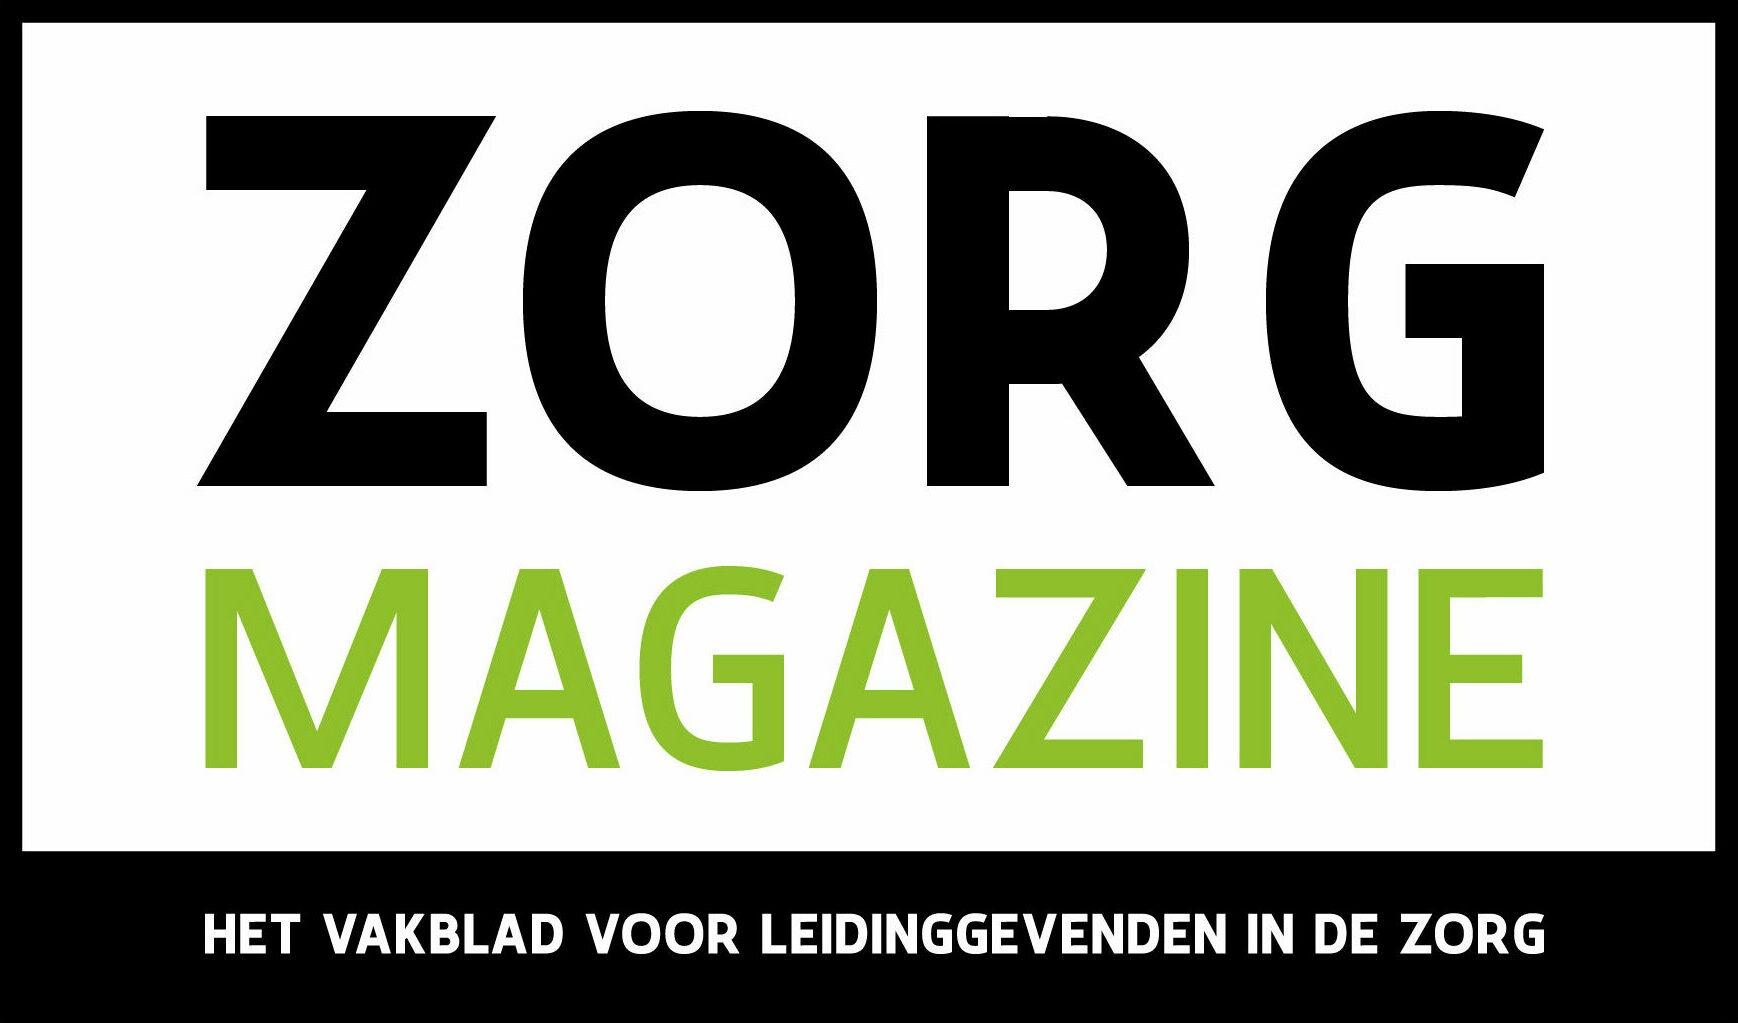 Logo-ZorgMagazine_Logo-Groot_Zwart-Groen-e1599139442349